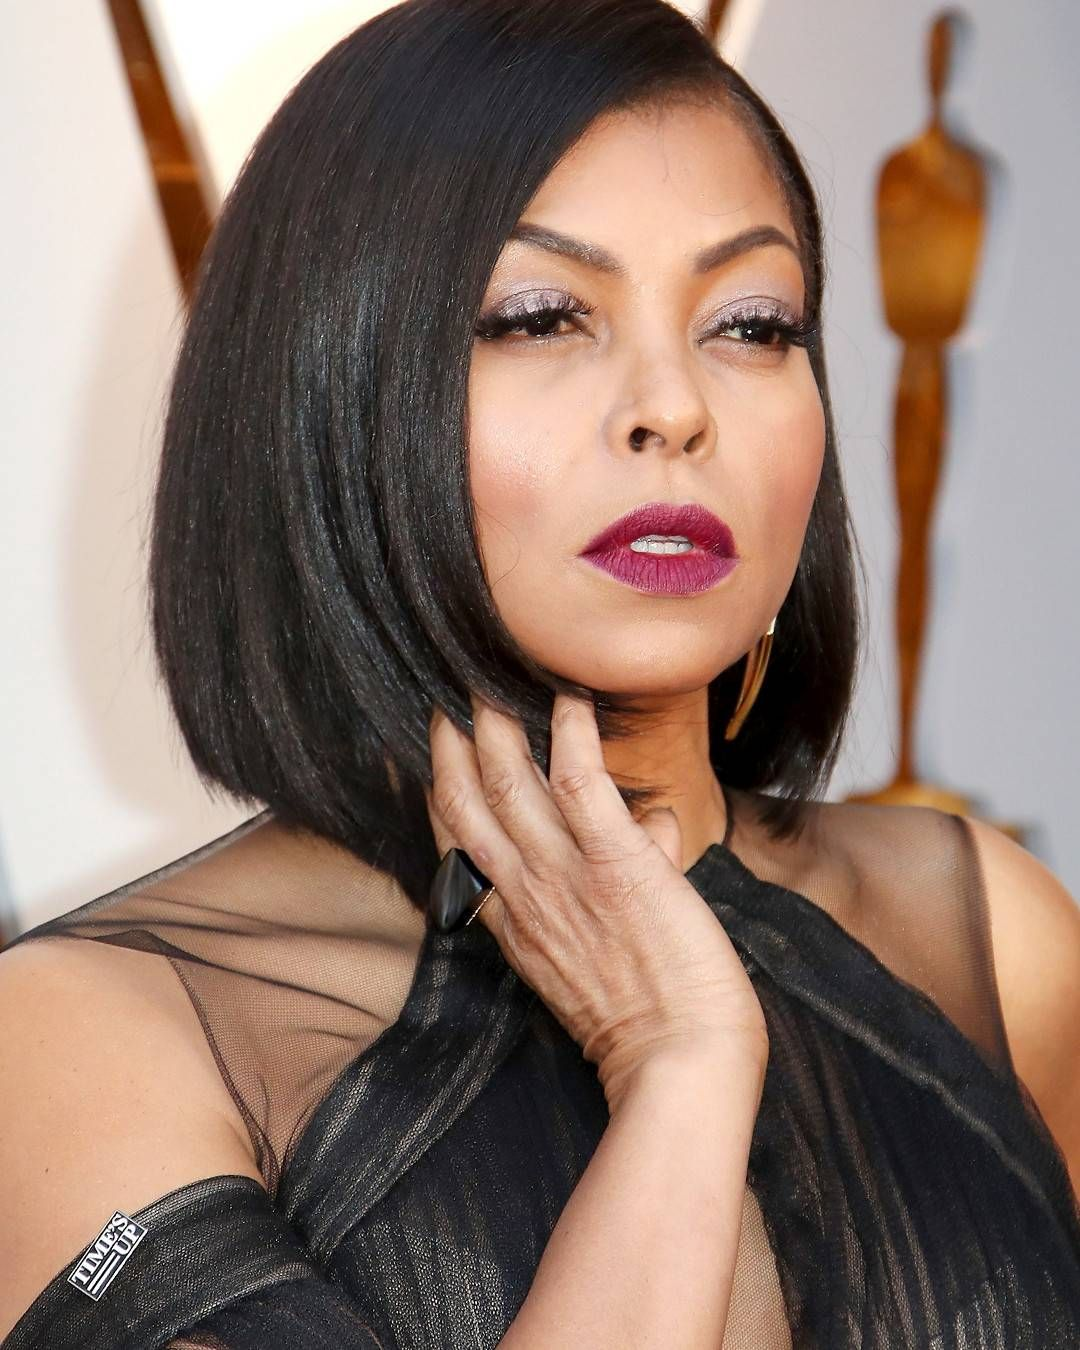 Taraji P. Henson's Makeup Pro Shares How to Get Rid of